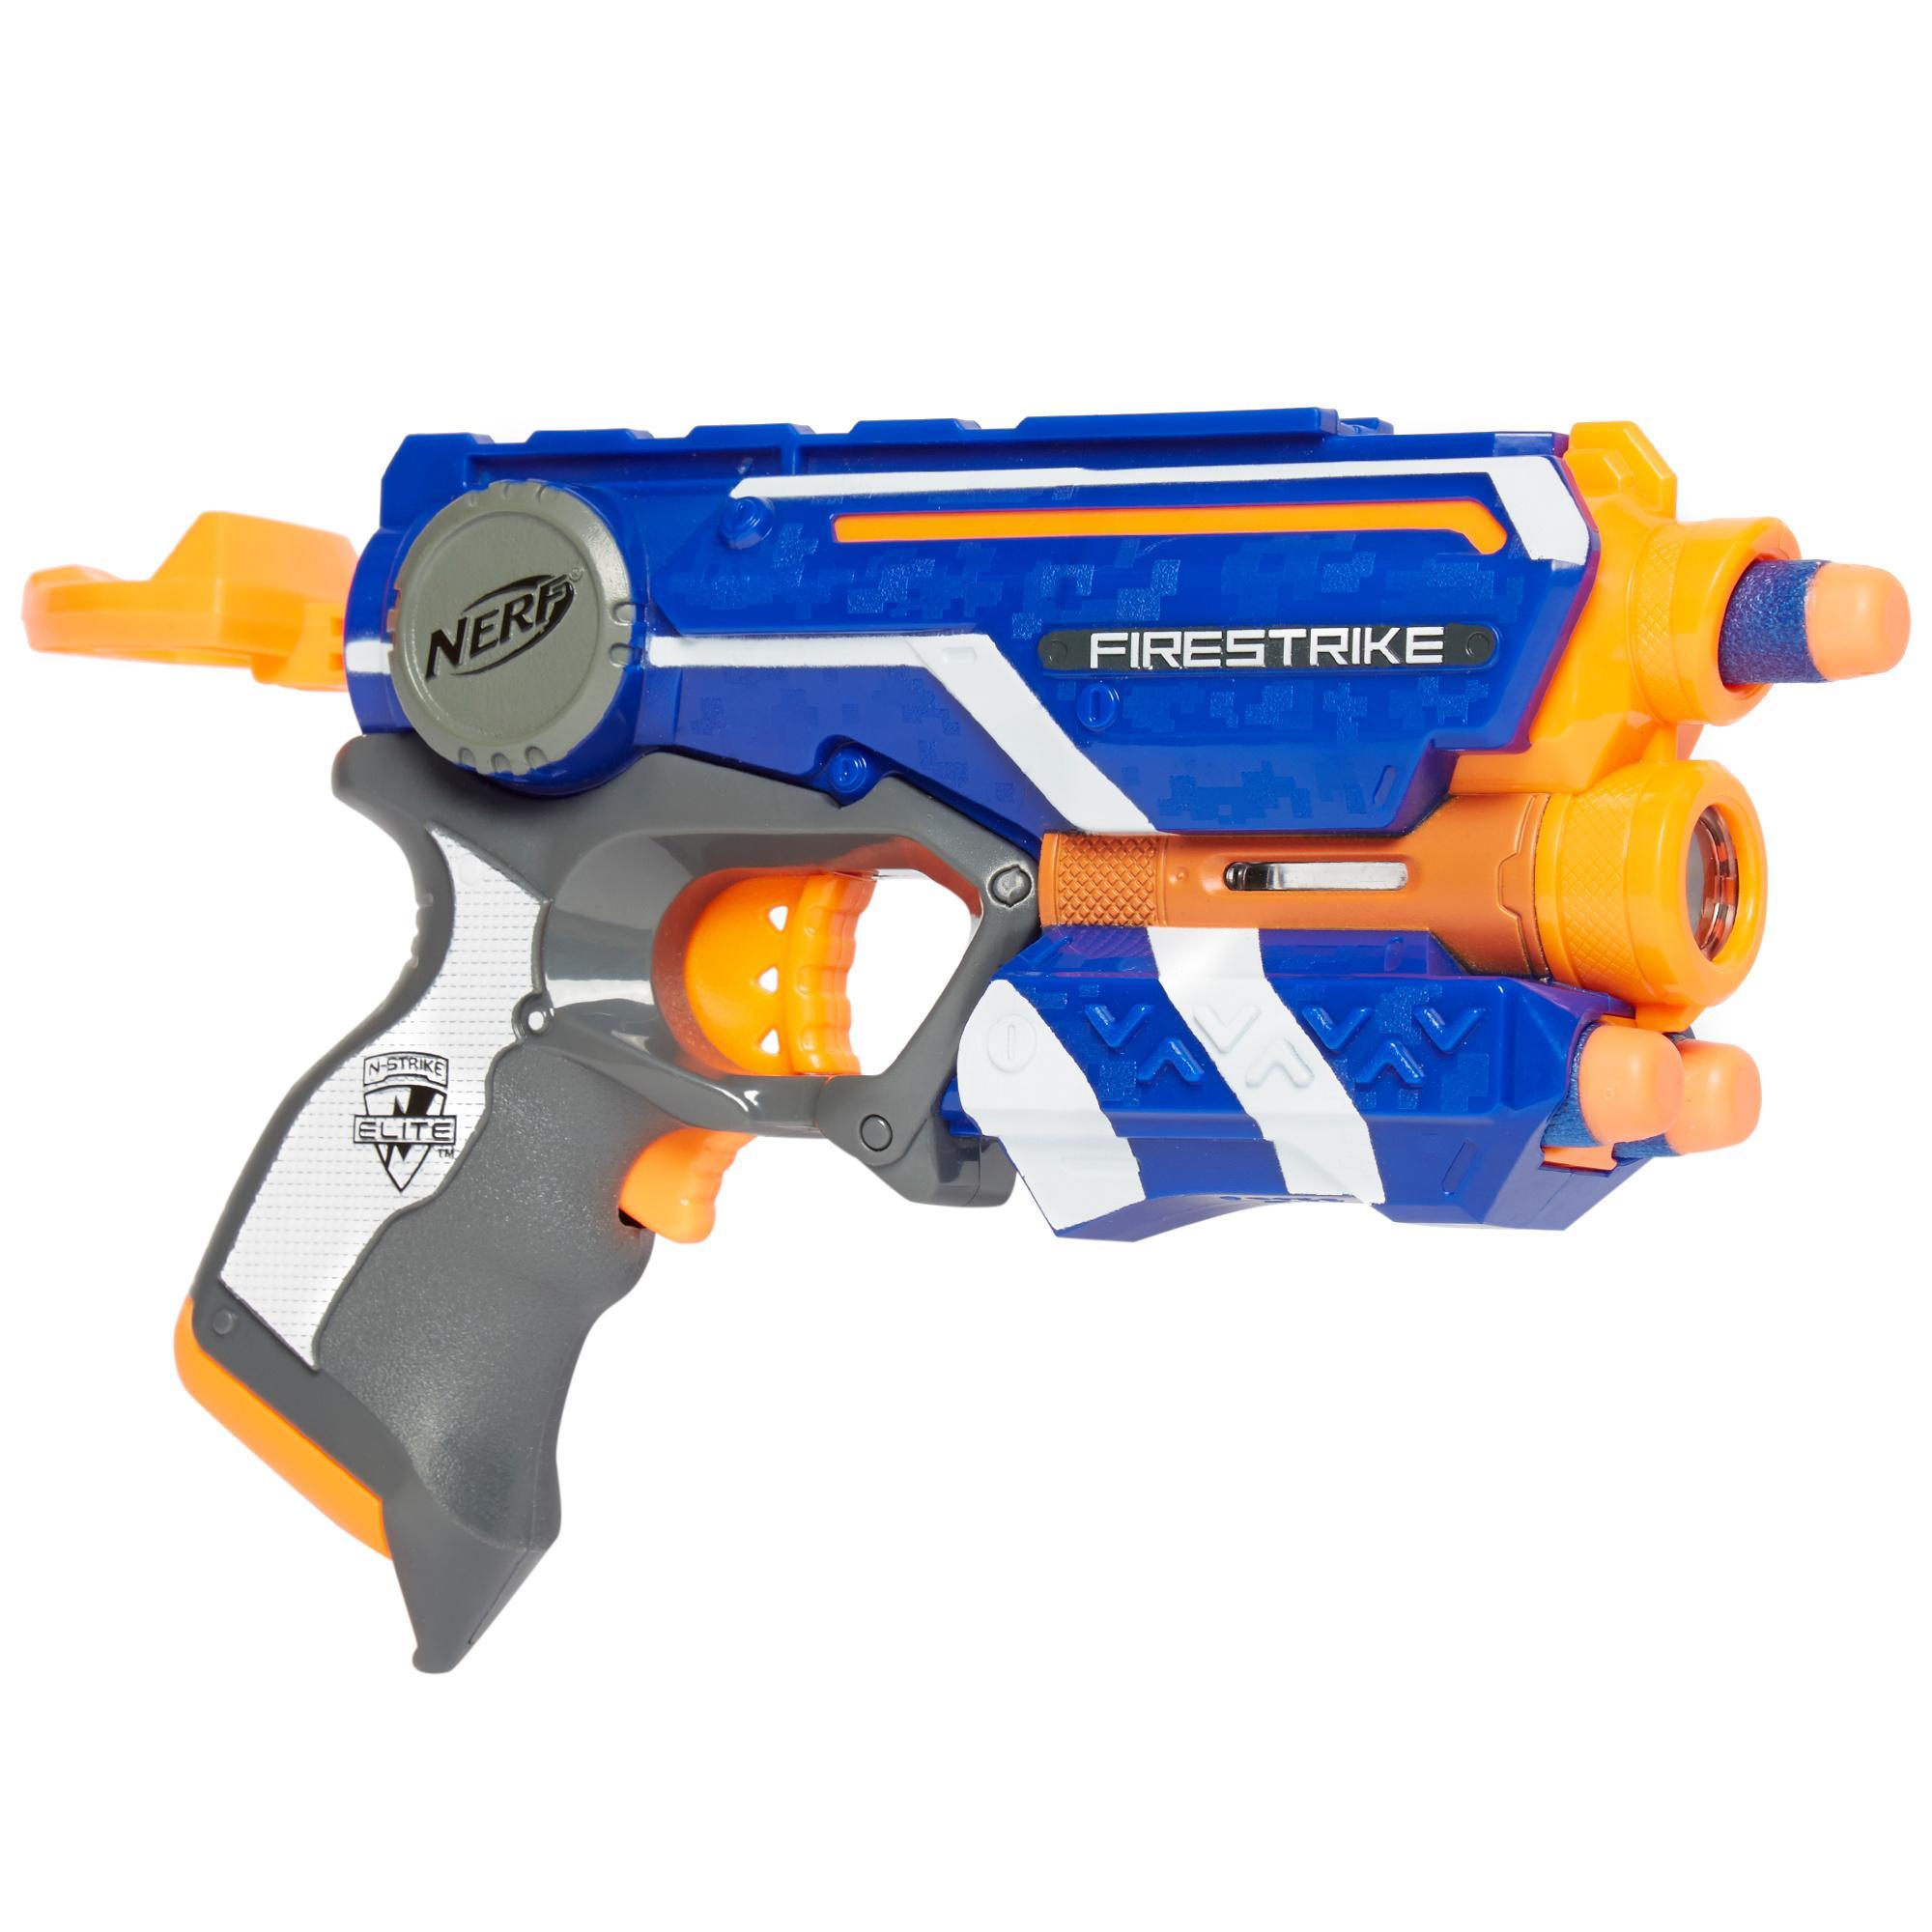 NERF Nerf N-Strike Firestrike Blaster - Blue, Blue